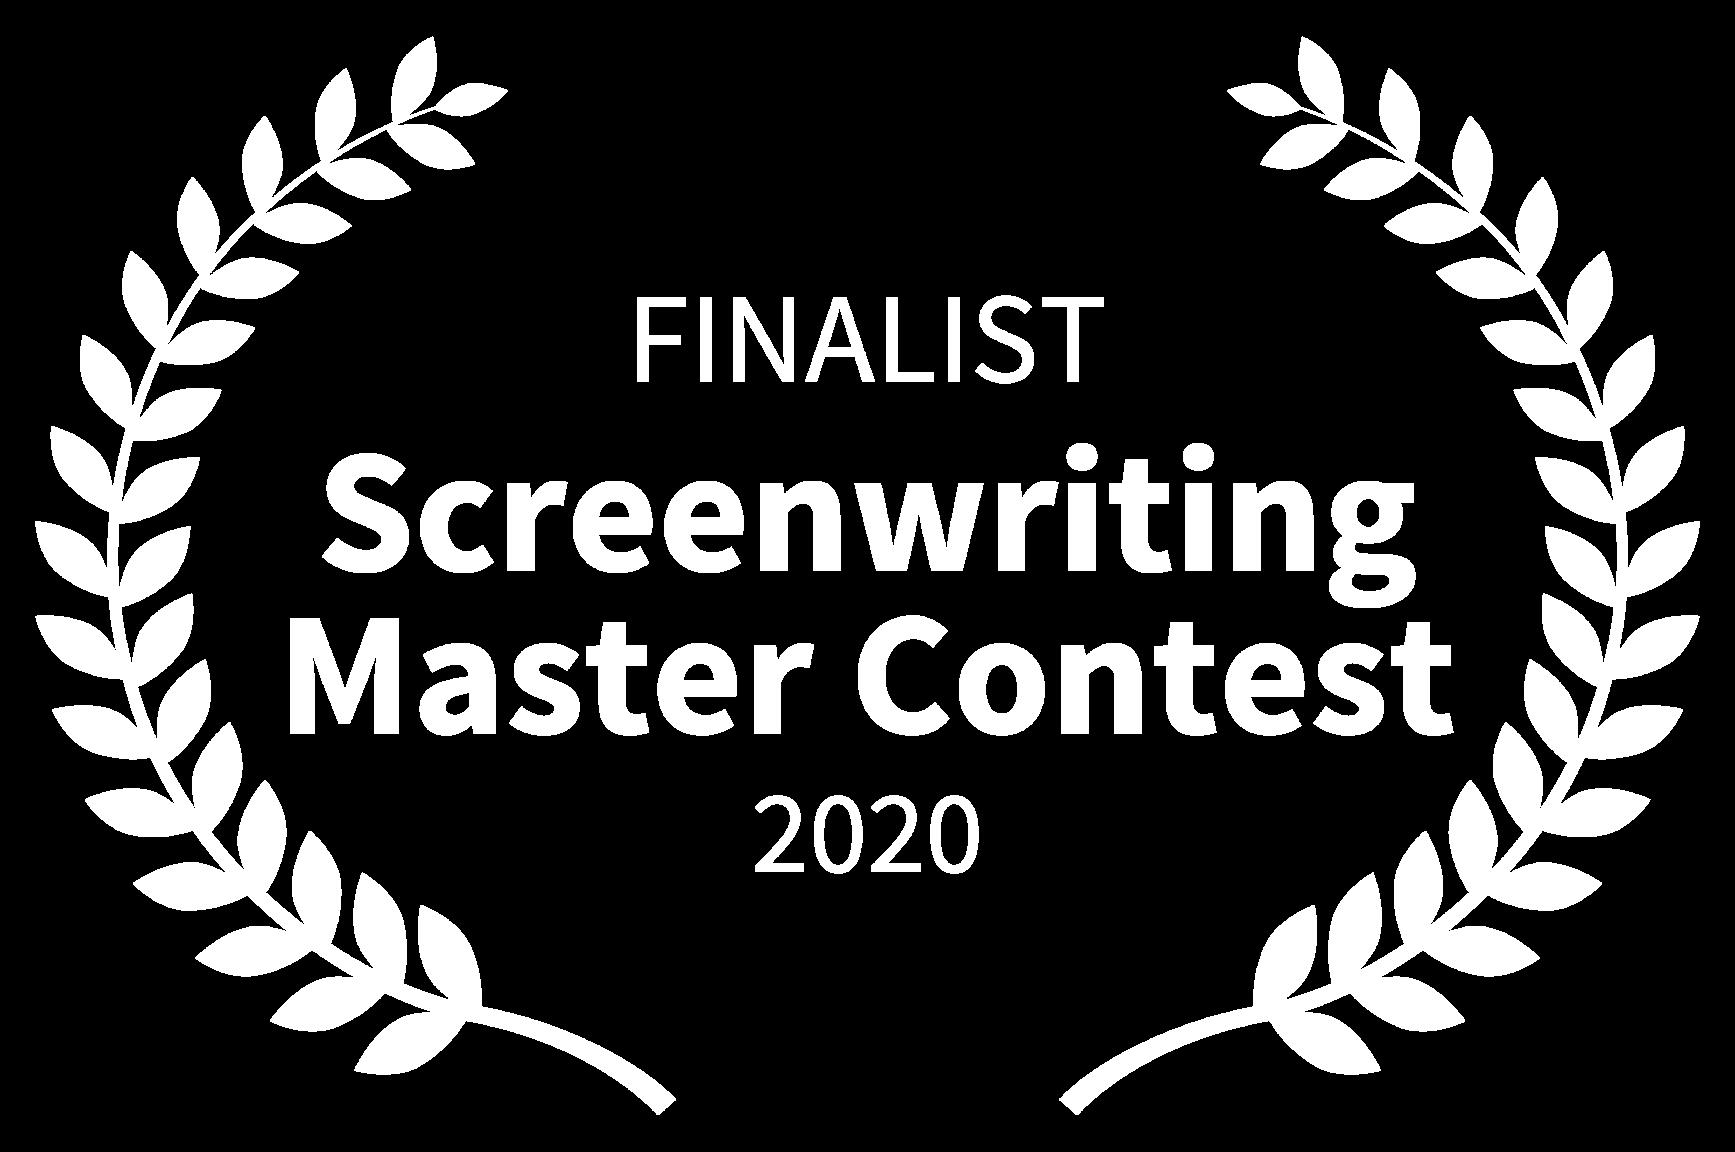 FINALIST - Screenwriting Master Contest - 2020